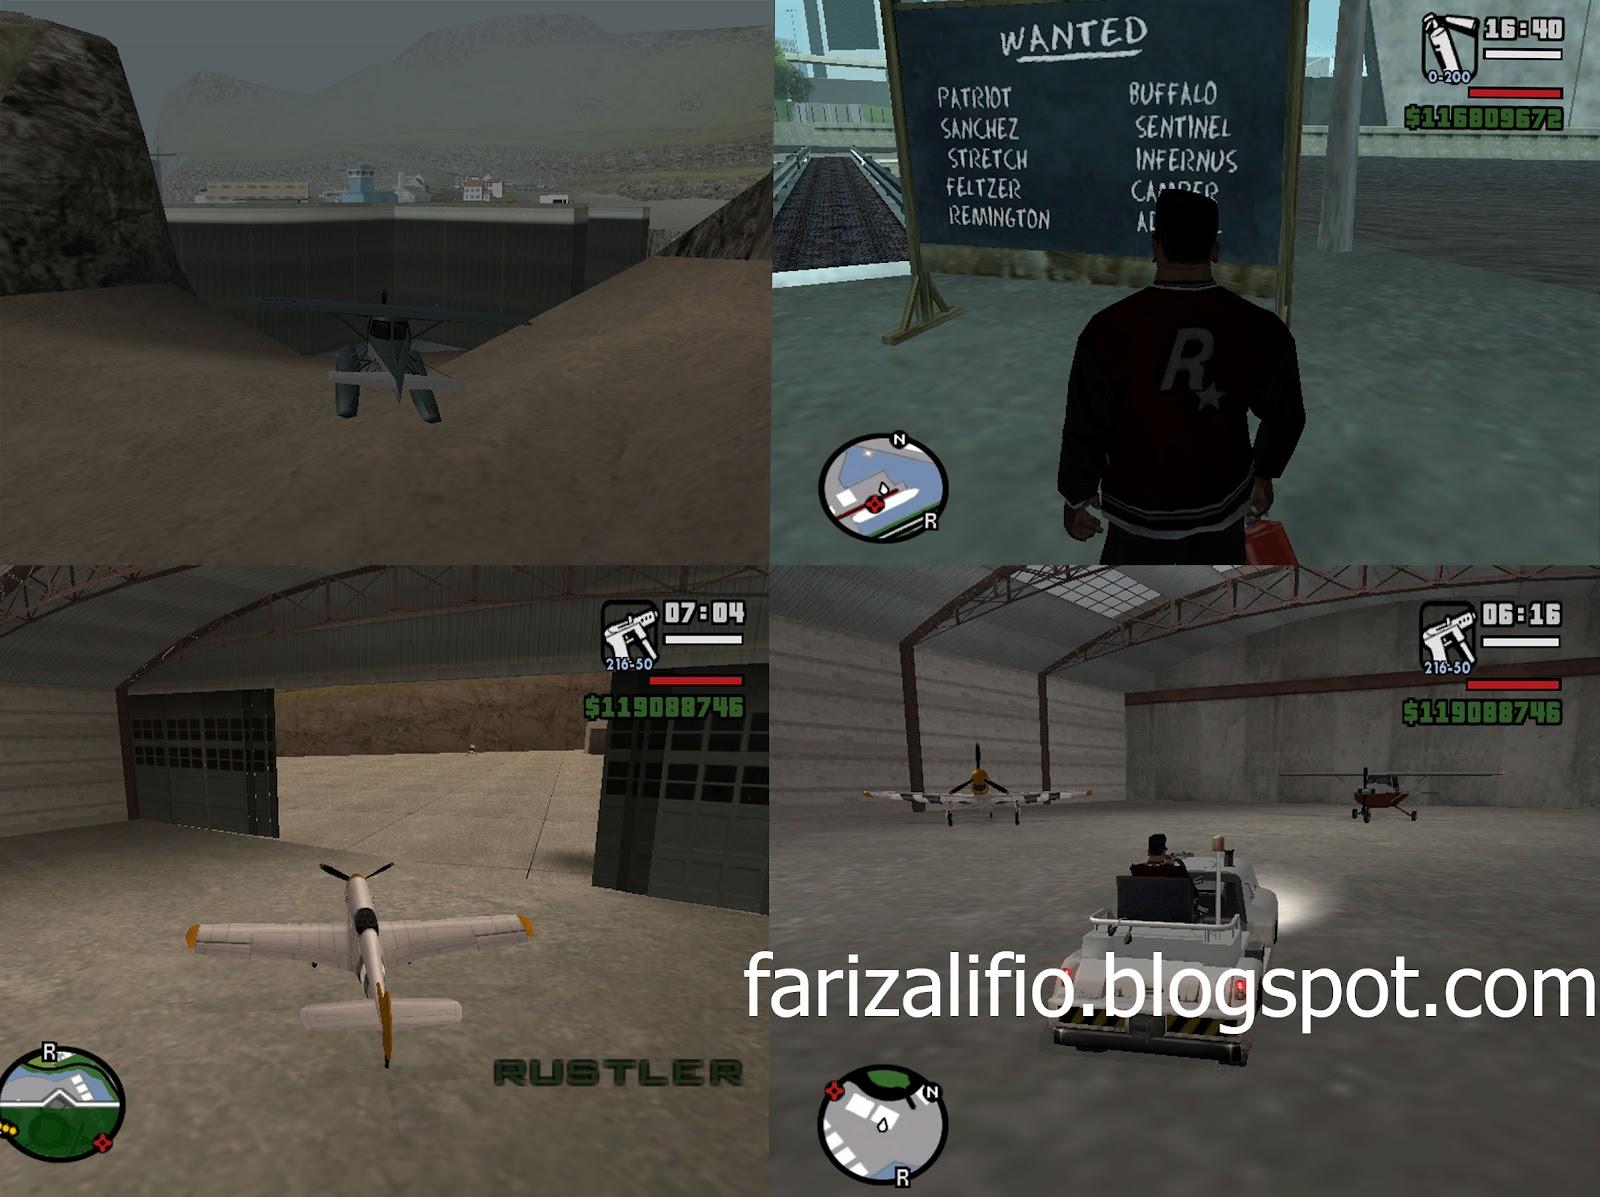 ... Alifio's Blog: Free Download Game GTA San Andreas Full RIP + cheat